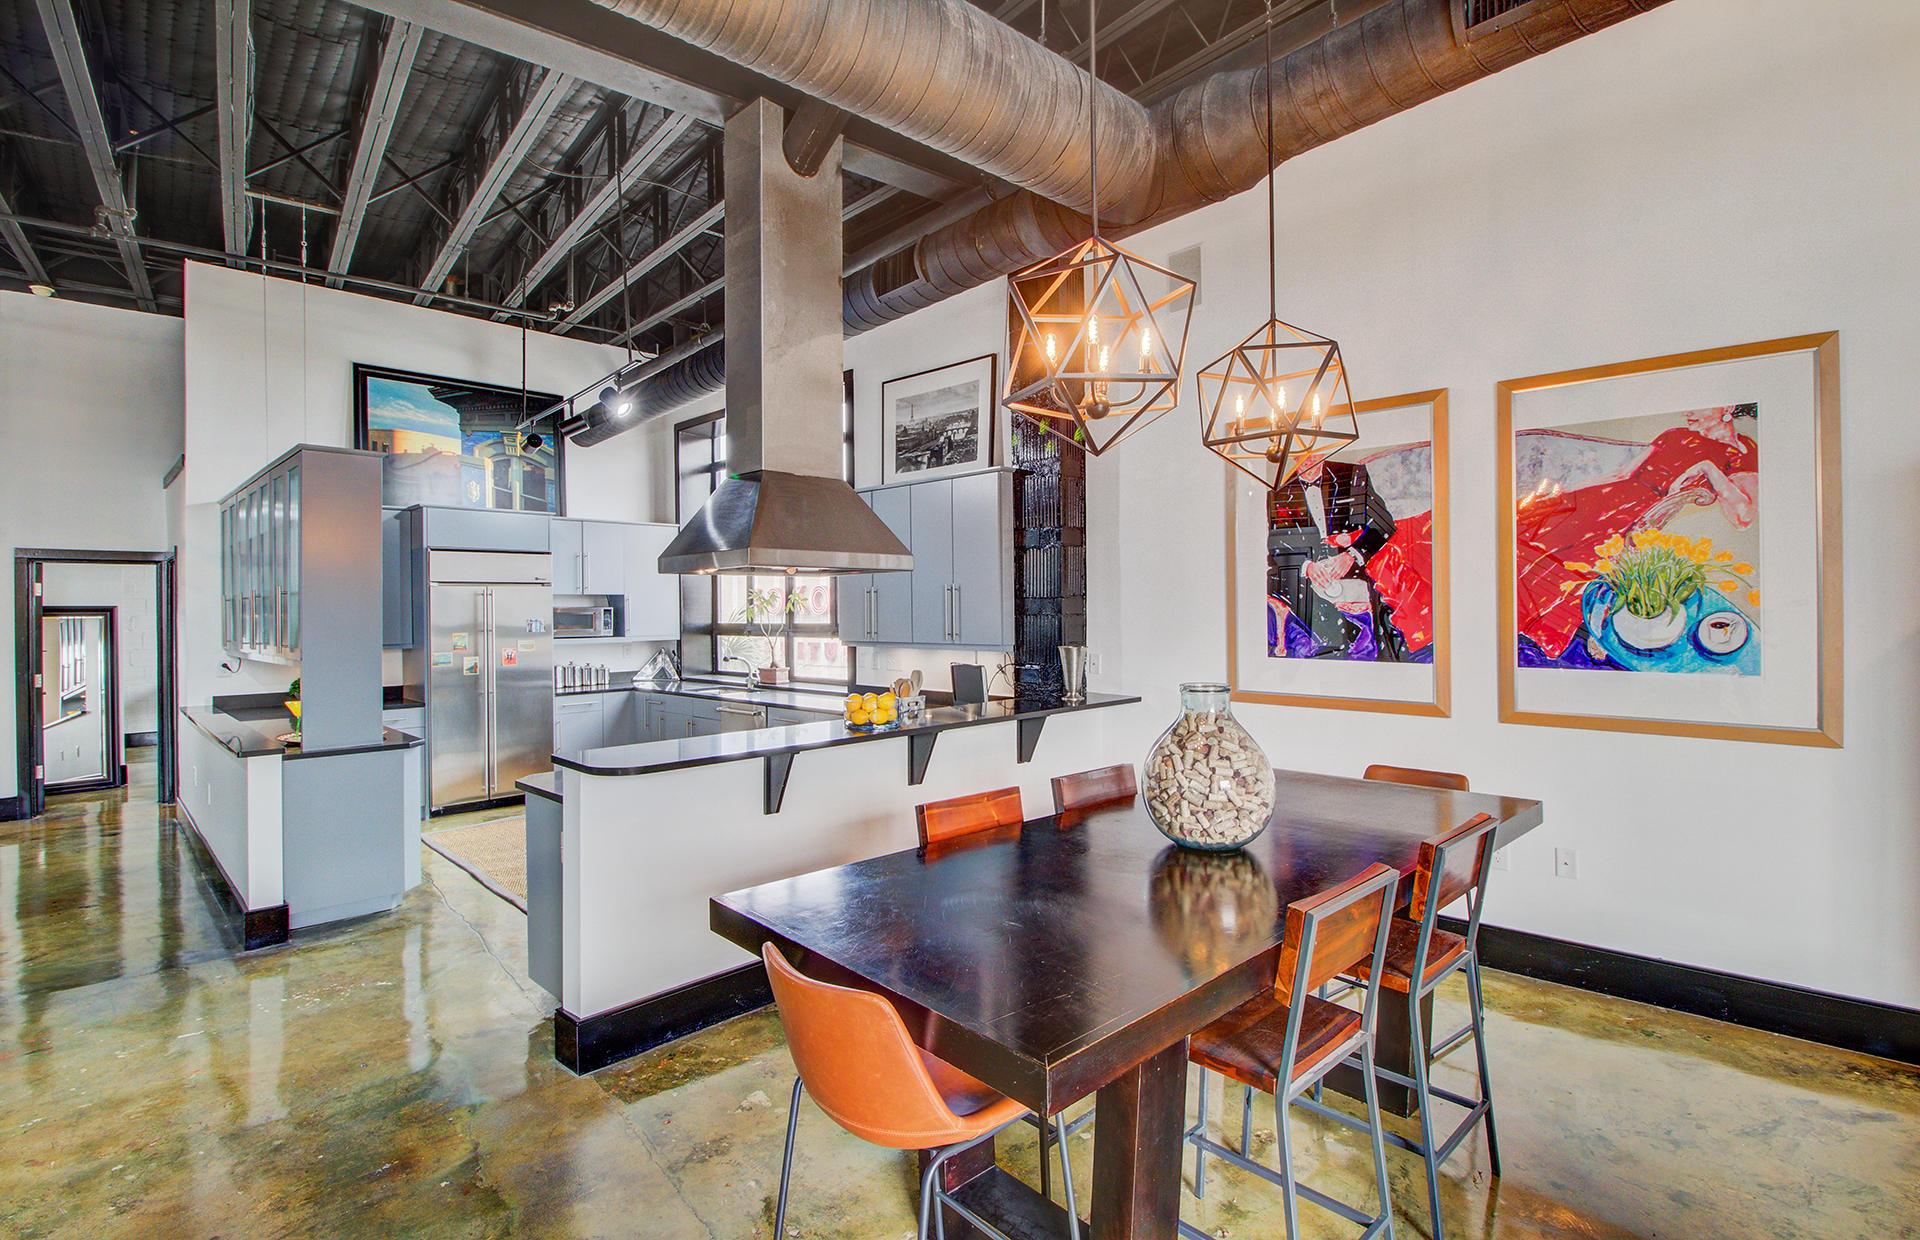 King Street Lofts Homes For Sale - 517 King, Charleston, SC - 13